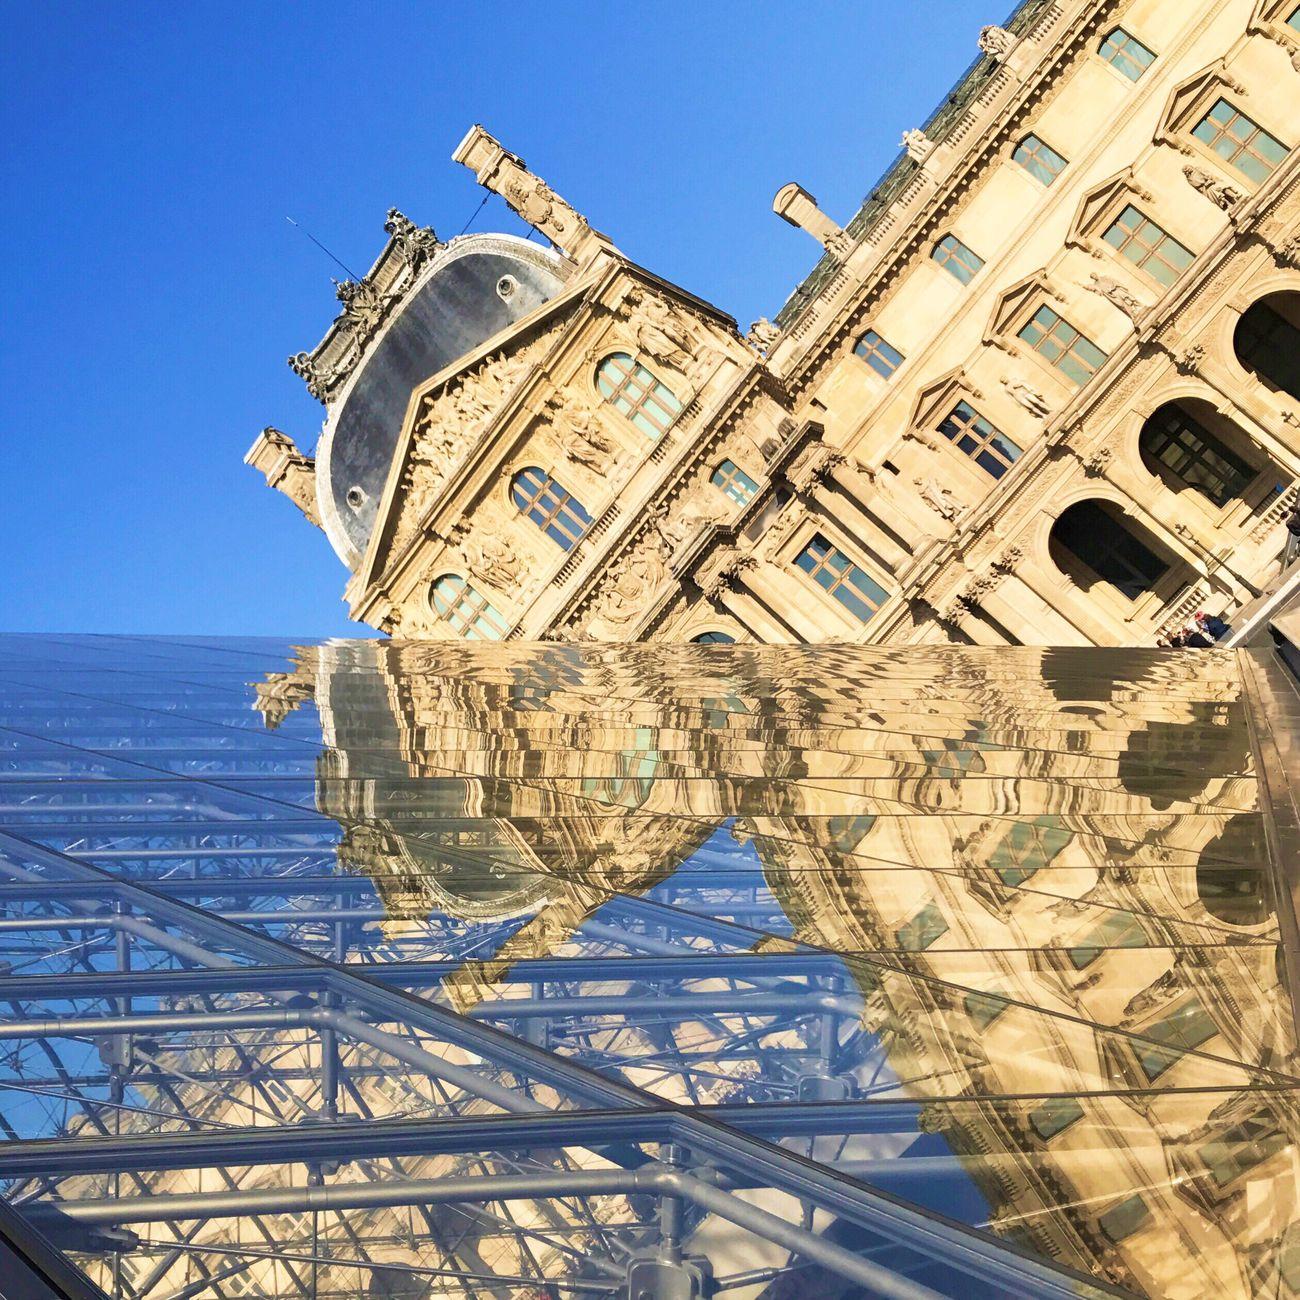 Blue skies! Bonsoir Paris! Architecture Clear Sky Travel Destinations Louvre Parisweloveyou Photooftheday Paris EyeEm Best Shots Clear Sky Eyem Best Shot - Architecture Architecture